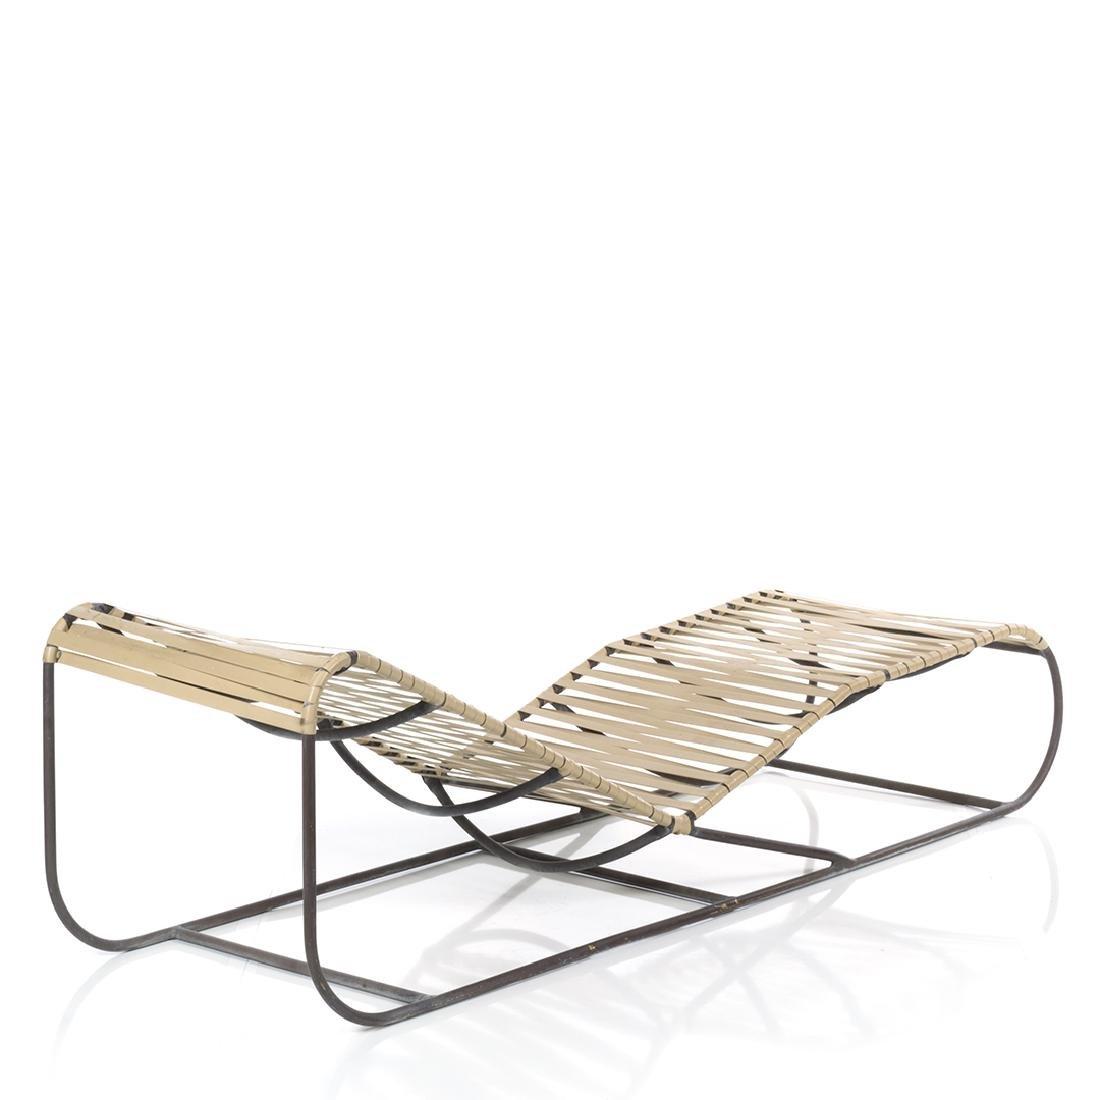 Kipp Stewart Bronze Chaise Lounges (2) - 5